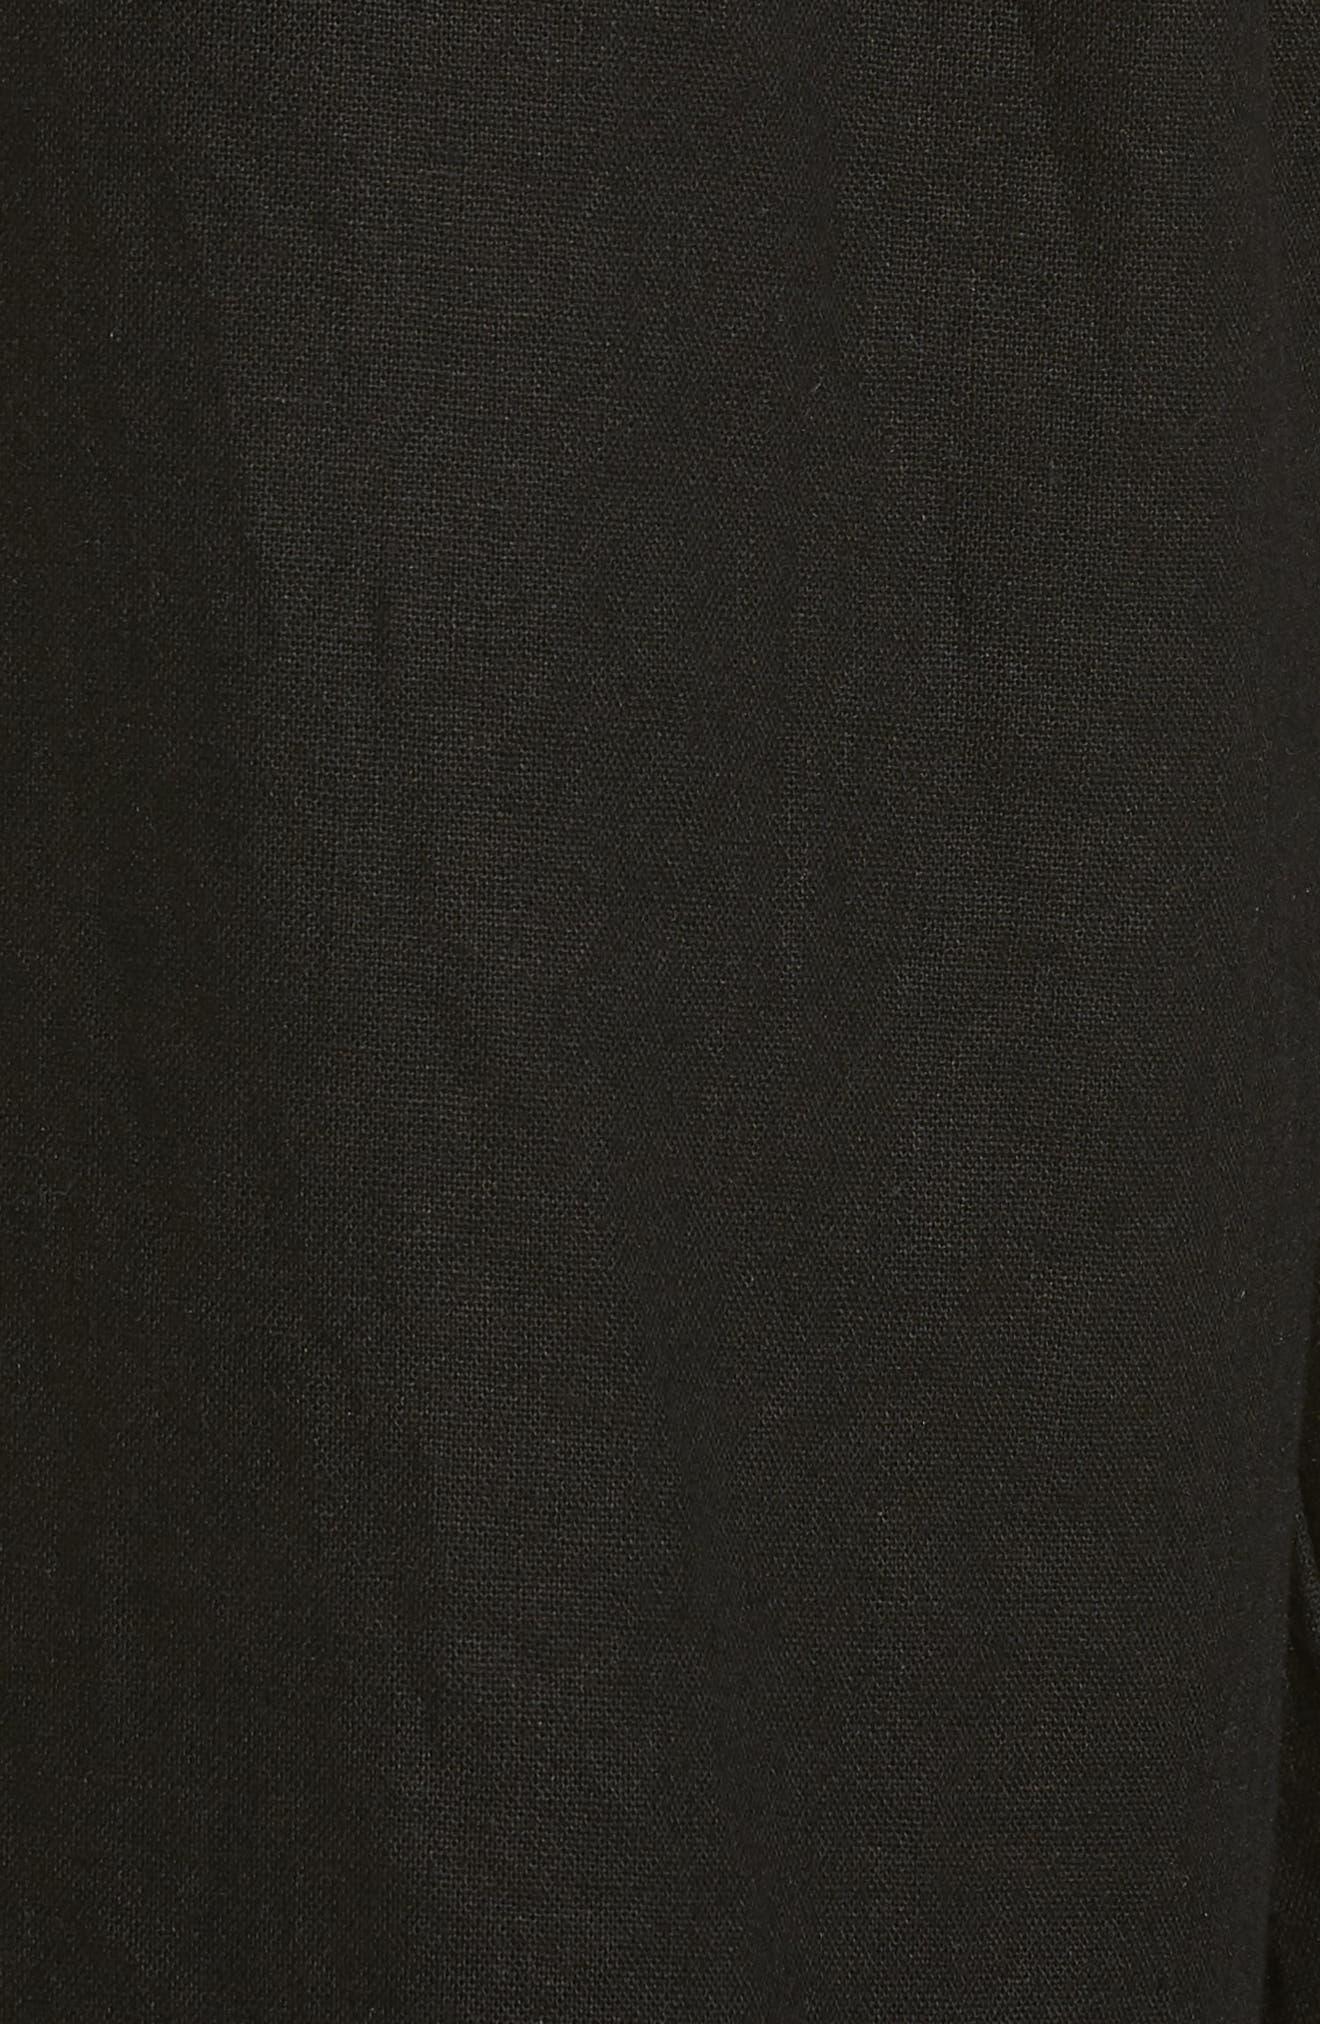 Ruffle Hem Linen Blend Crop Pants,                             Alternate thumbnail 6, color,                             001